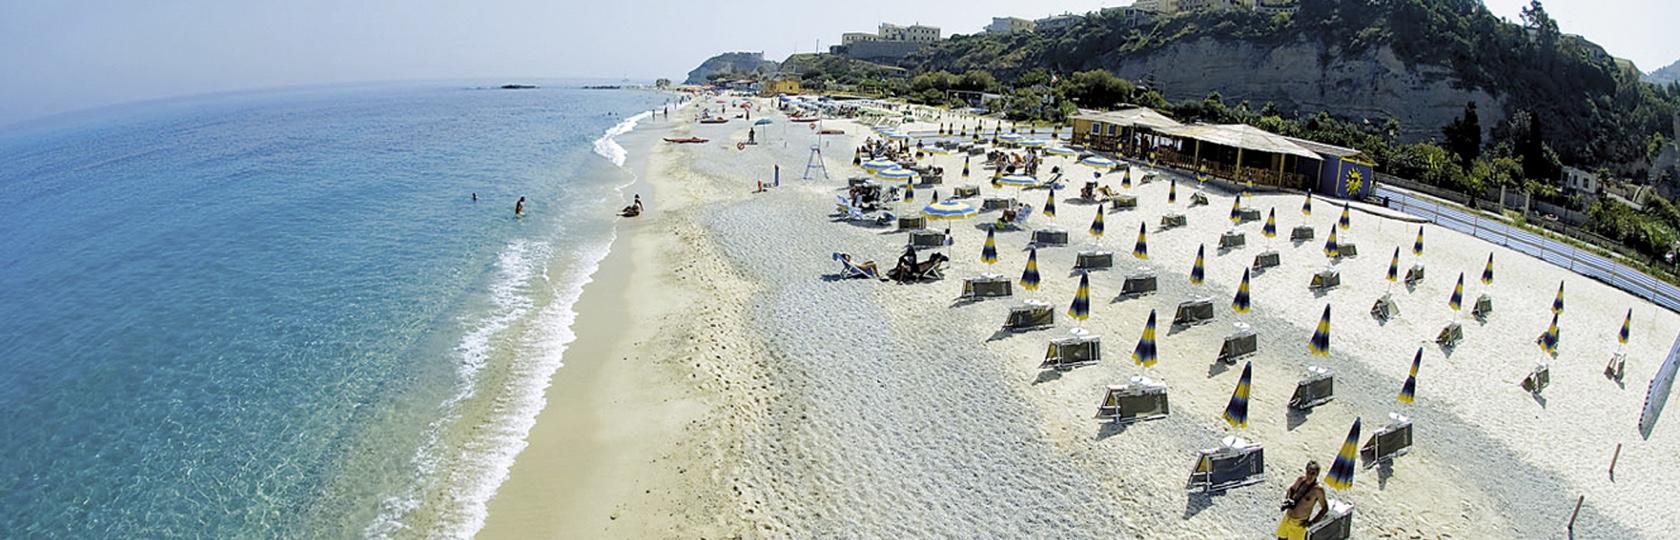 lapace_spiaggia_1.jpg